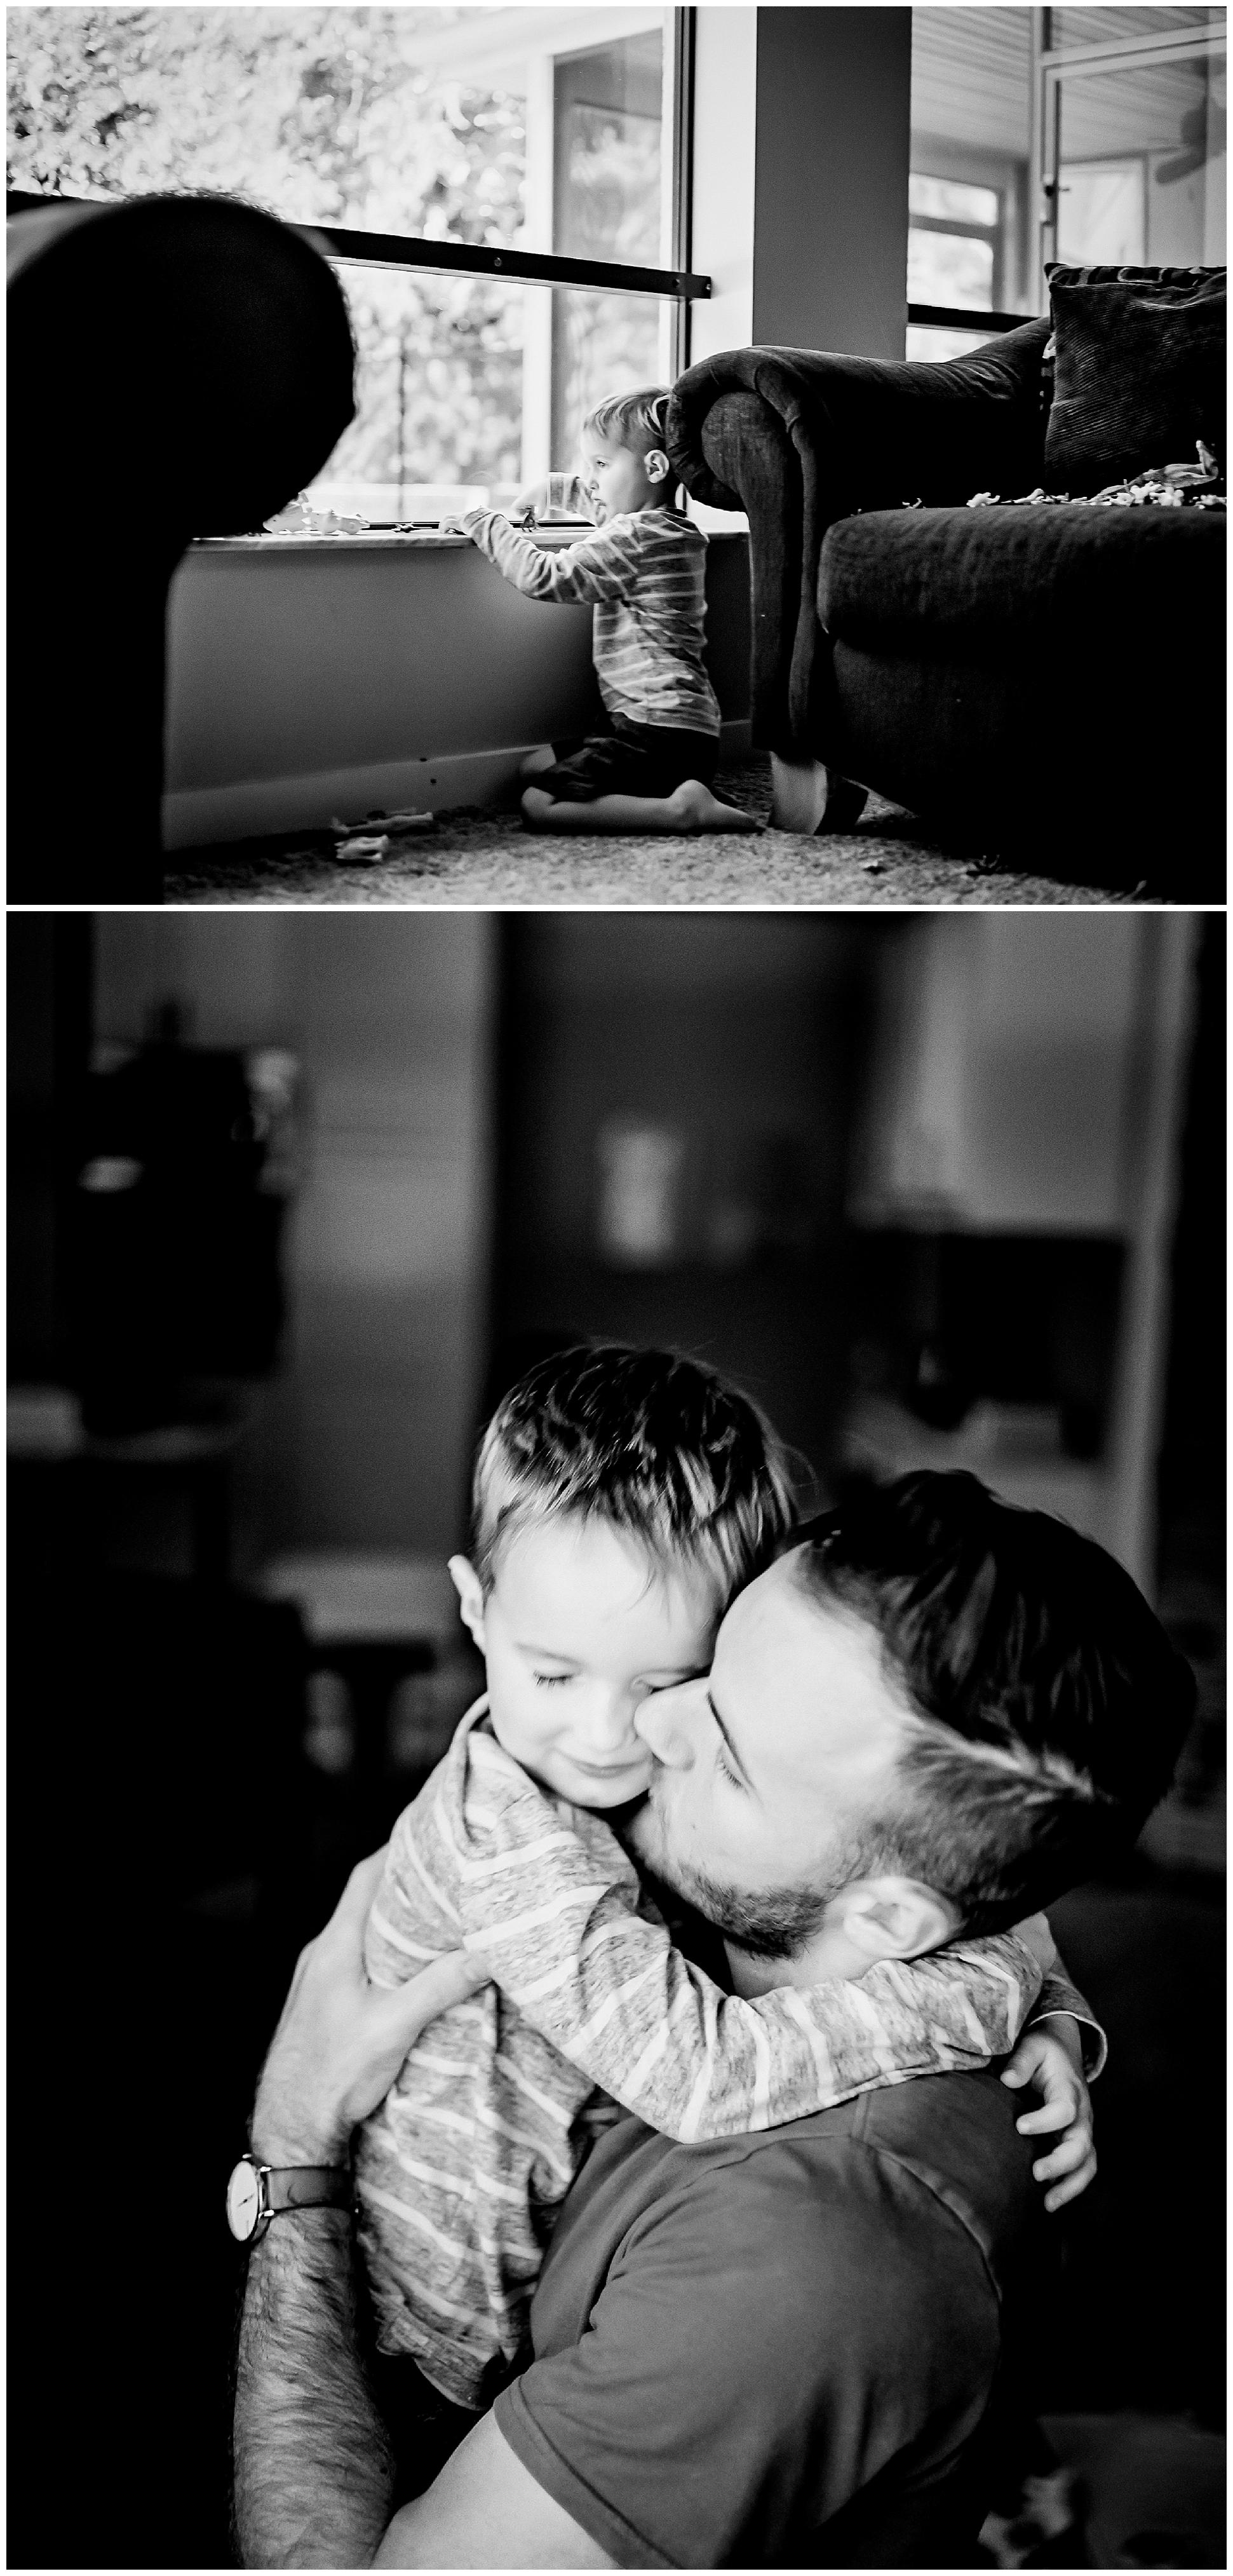 tampa-lifestyle-portrait-photographer-in-home-pentax-film-vs-digital_0024.jpg